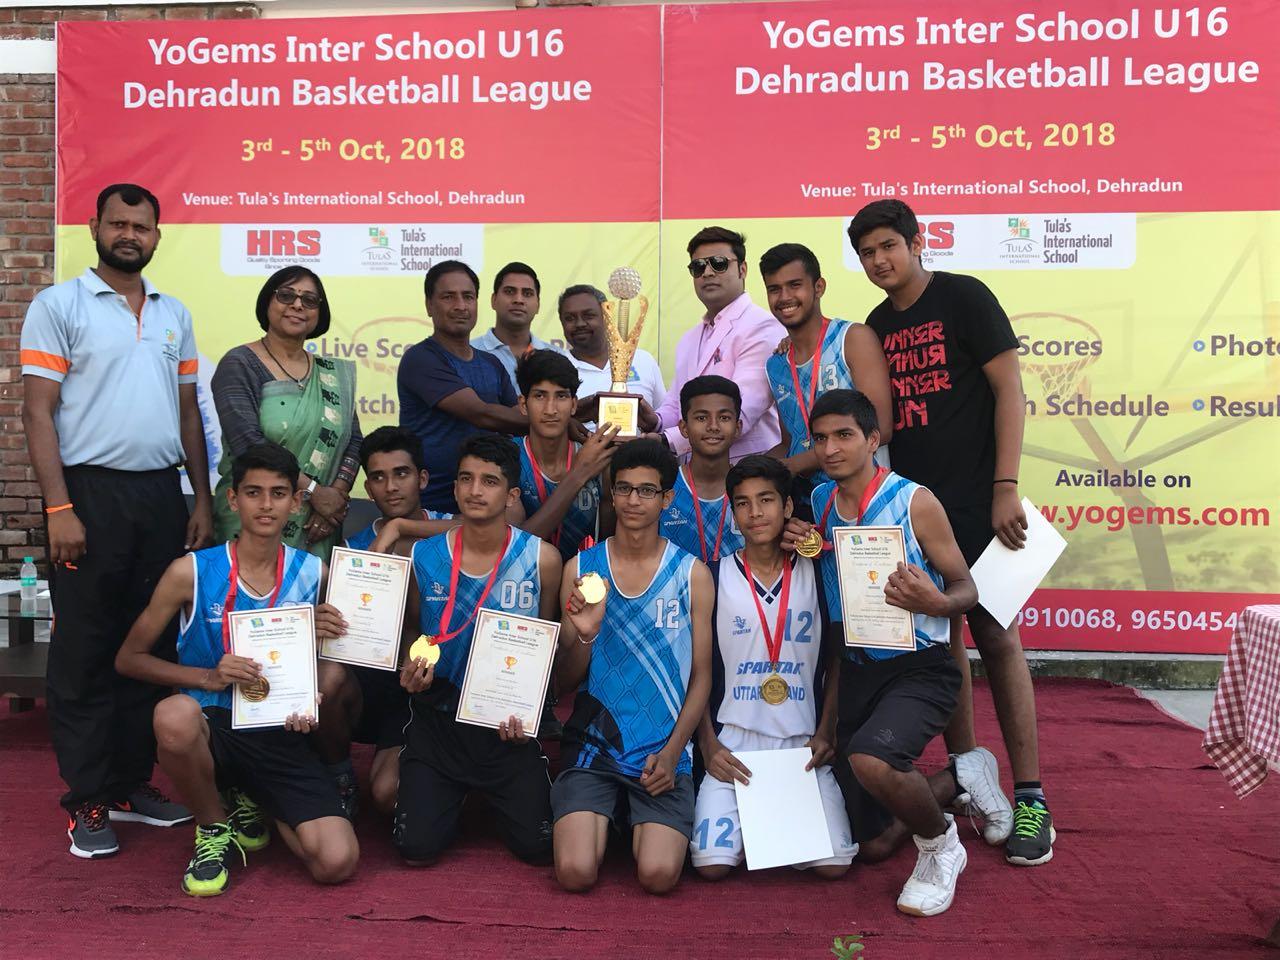 Dehradun Football Winning team